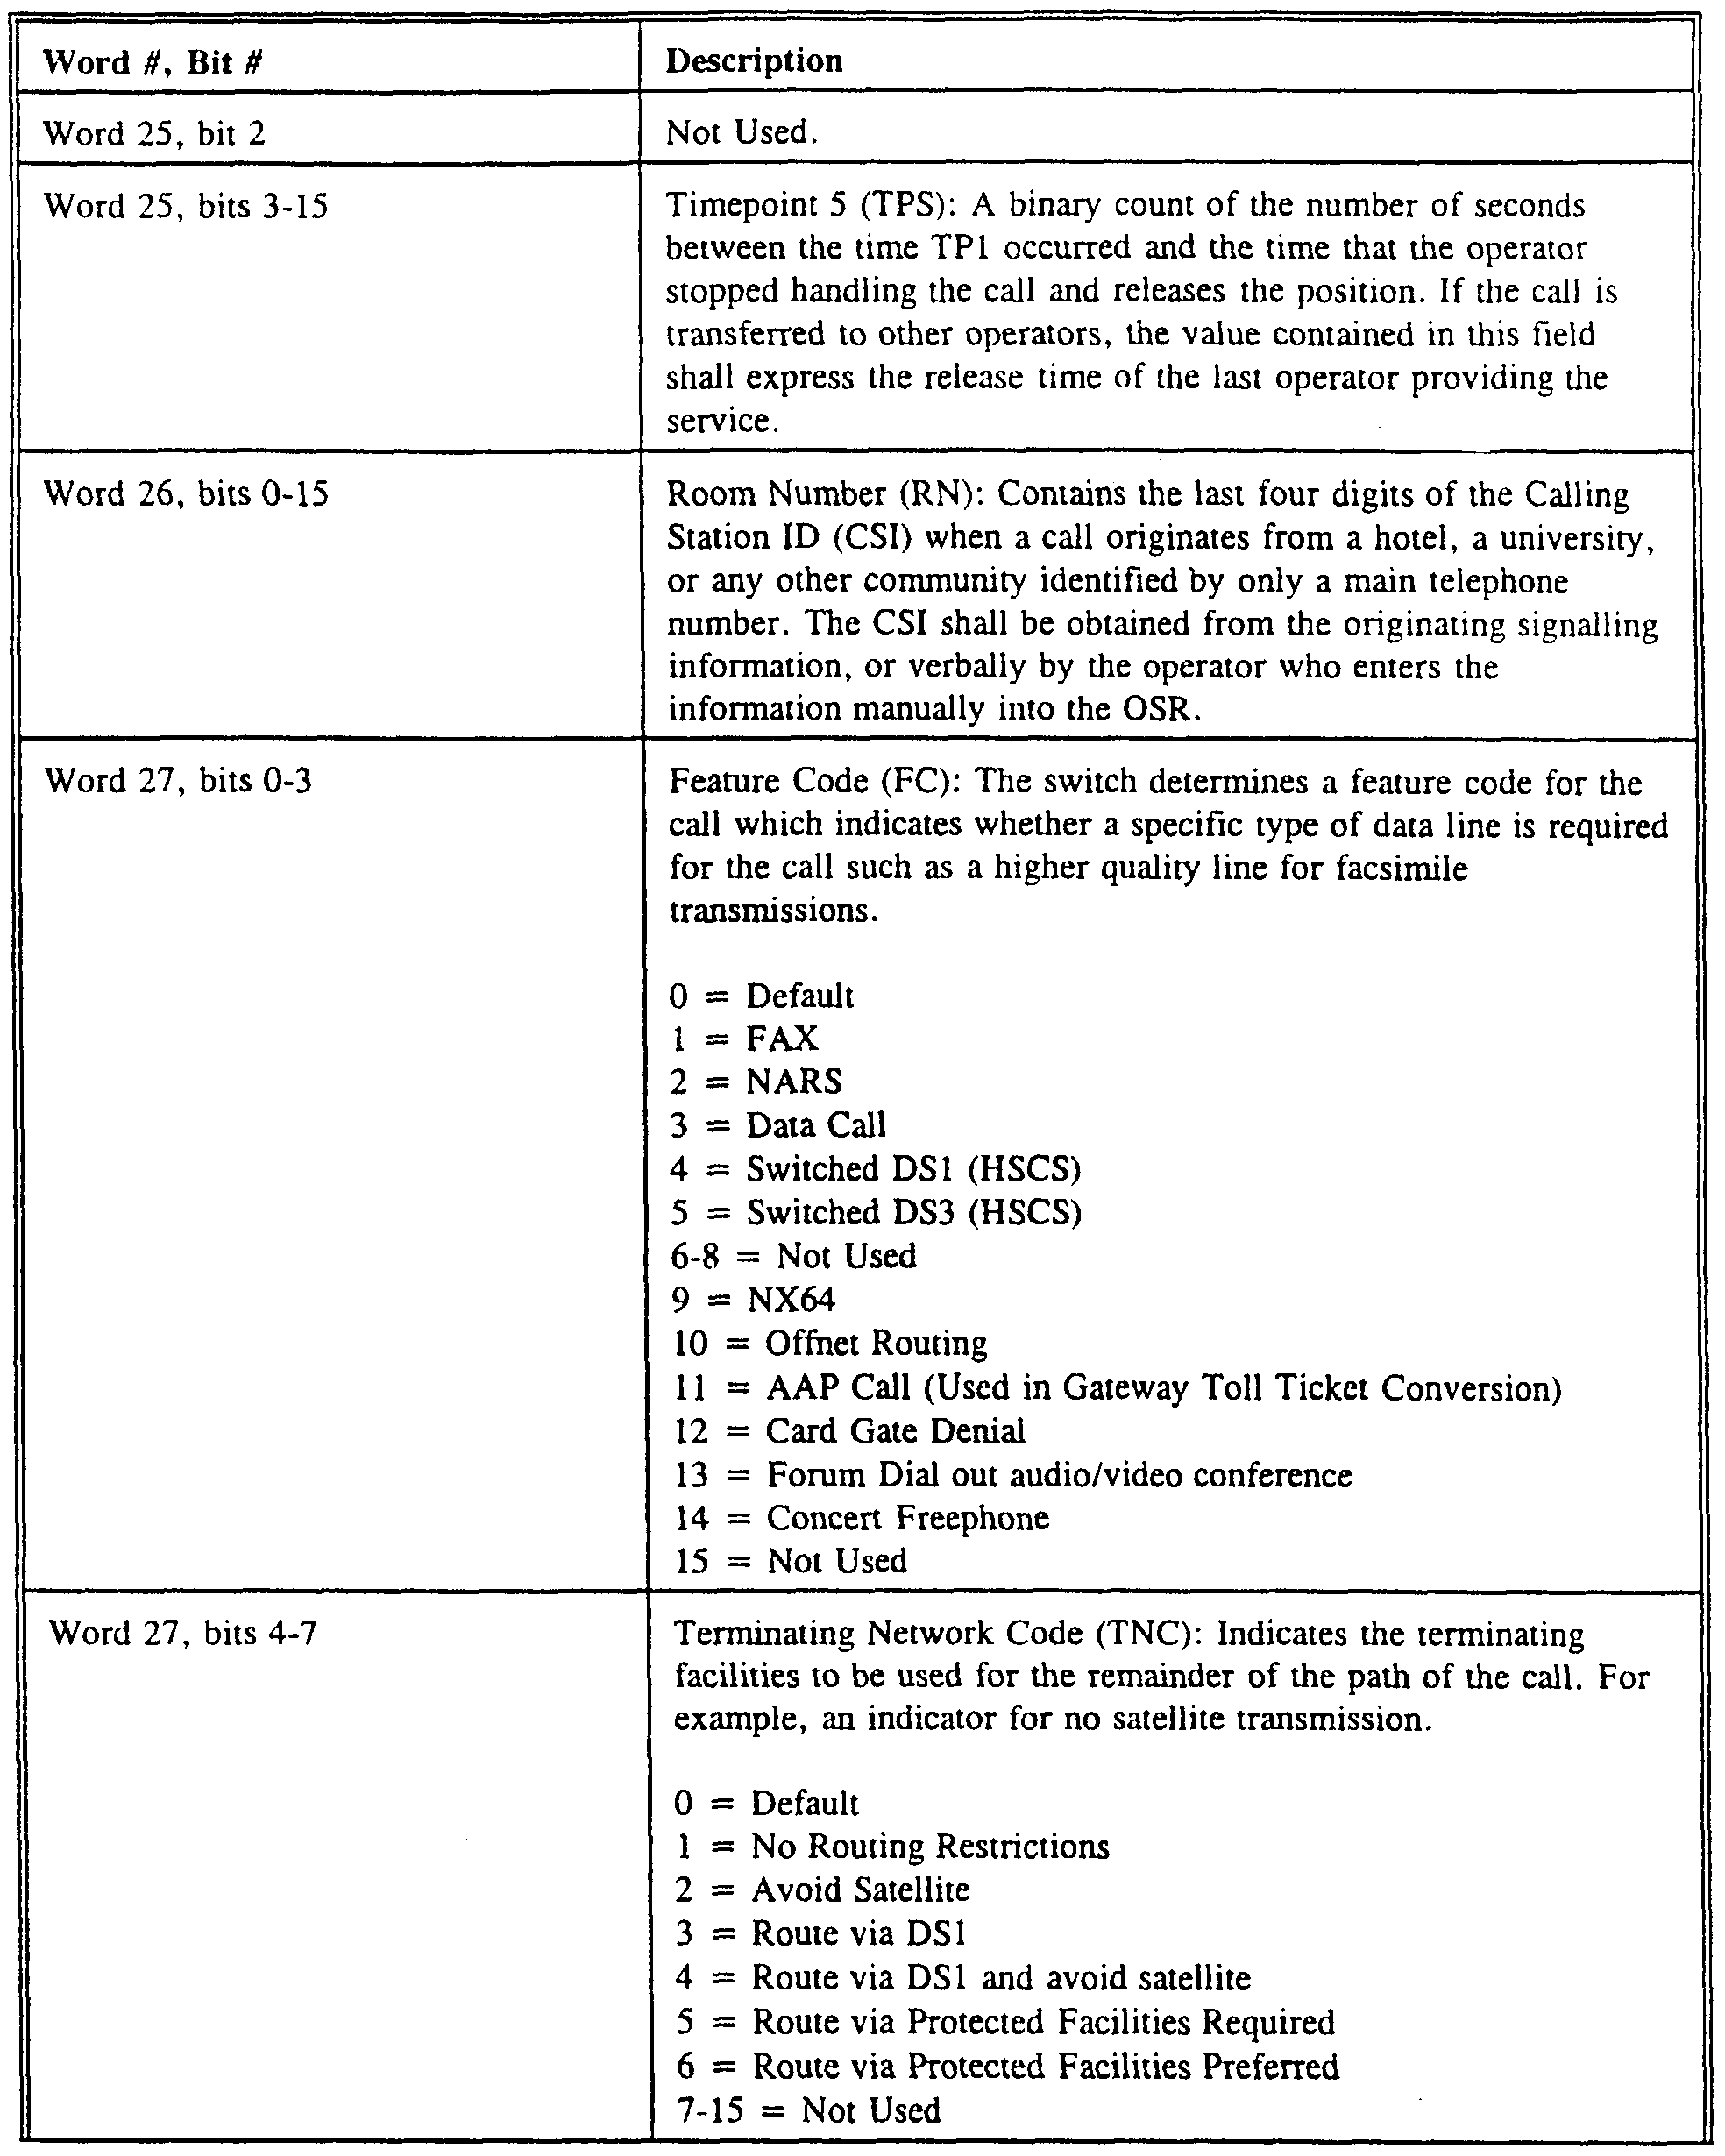 d774cda0 WO1998023080A2 - A communication system architecture - Google Patents